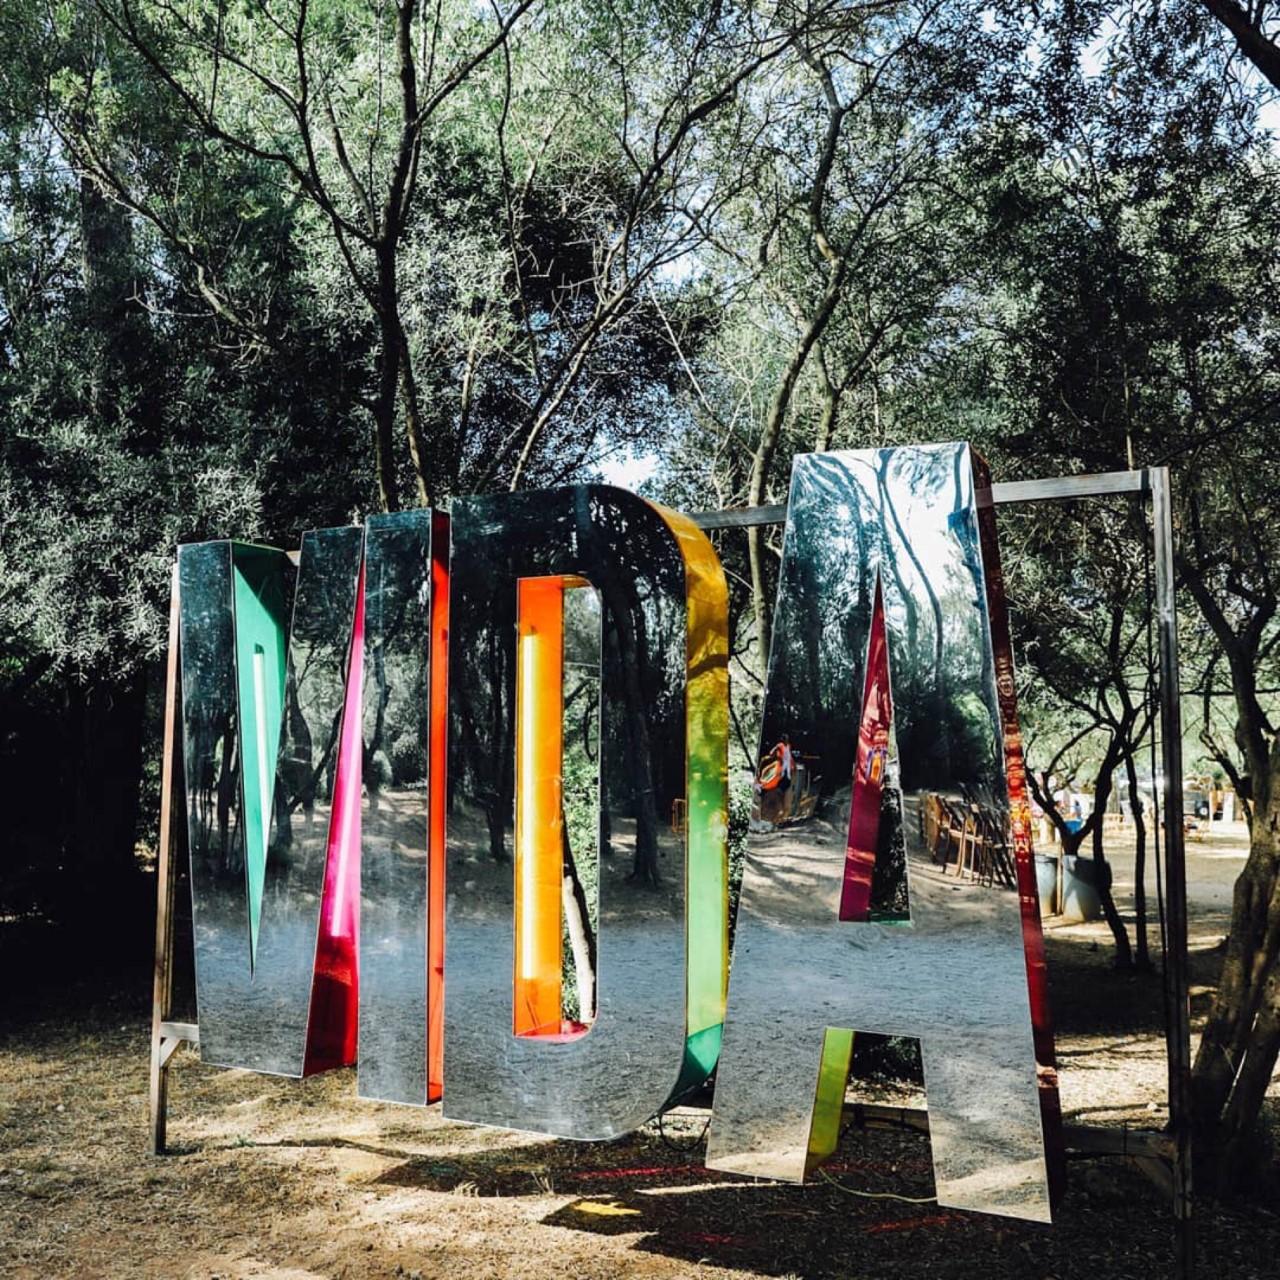 vida-metacrilato-colores-festivales-27lletres-02.jpeg